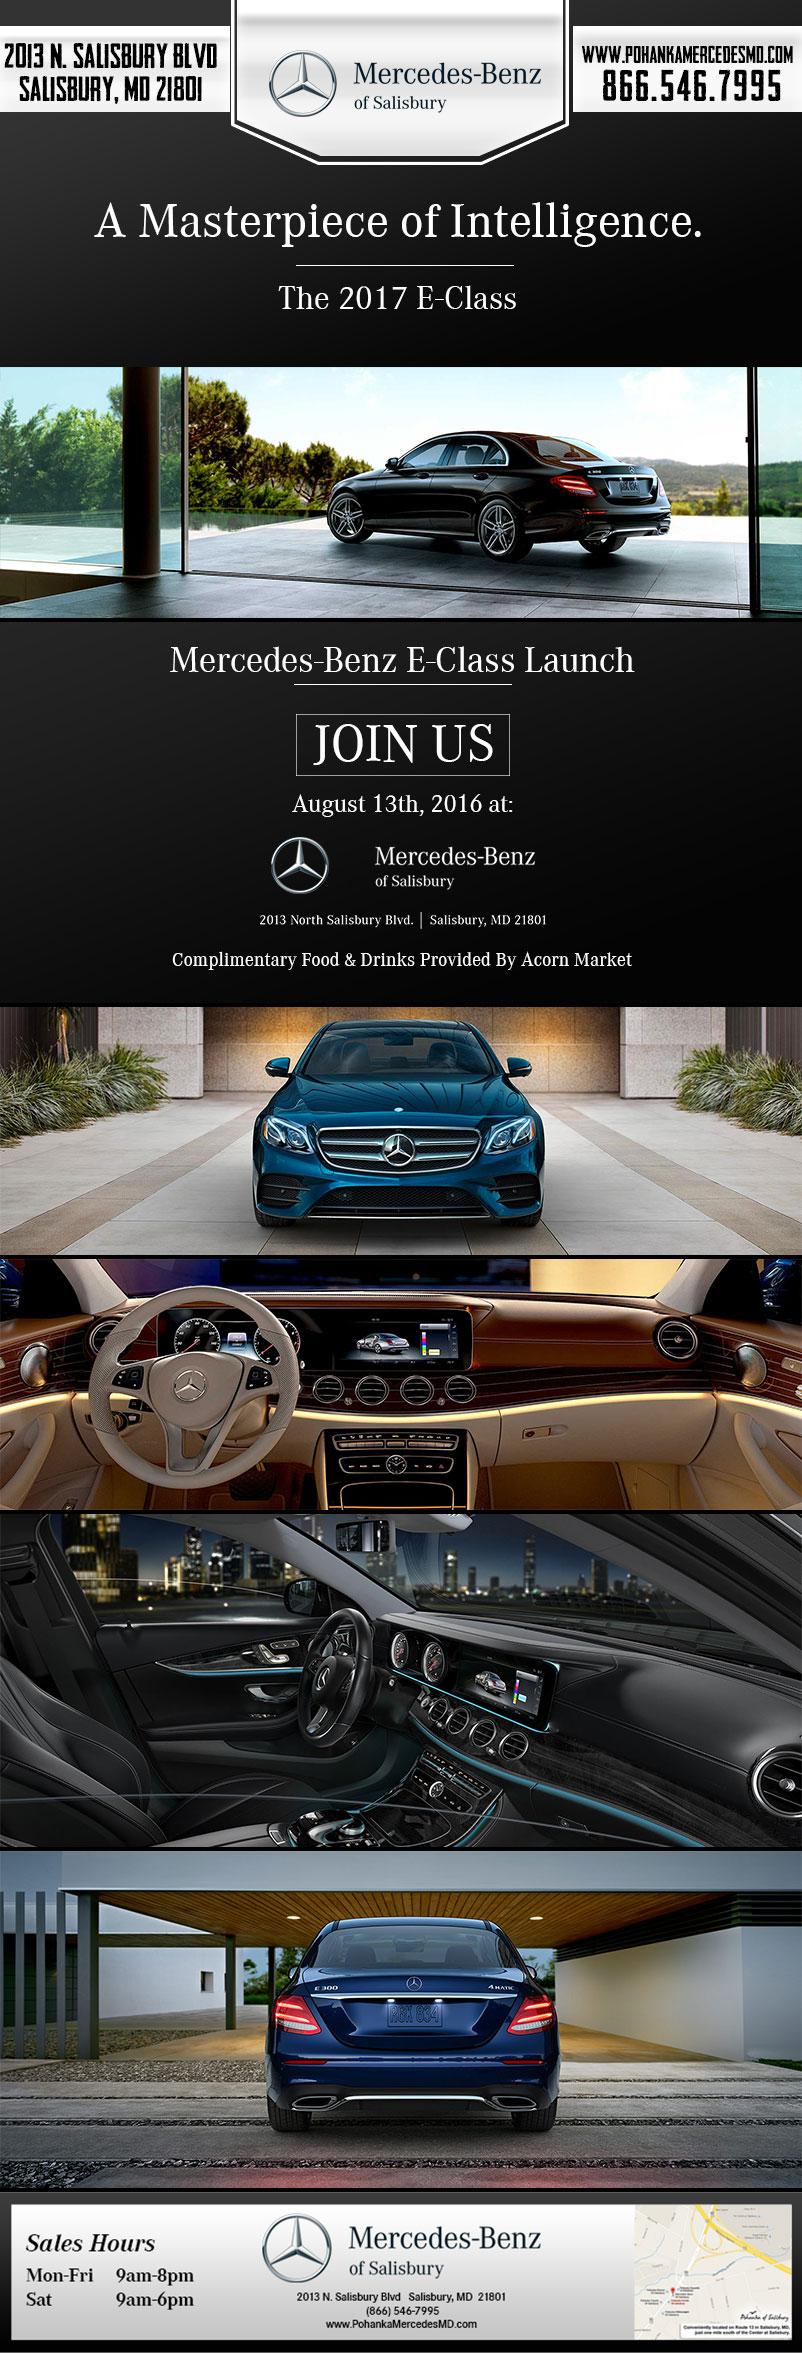 Aug16-E-Class-Launch-Mercedes-Sales-E-Blast.jpg